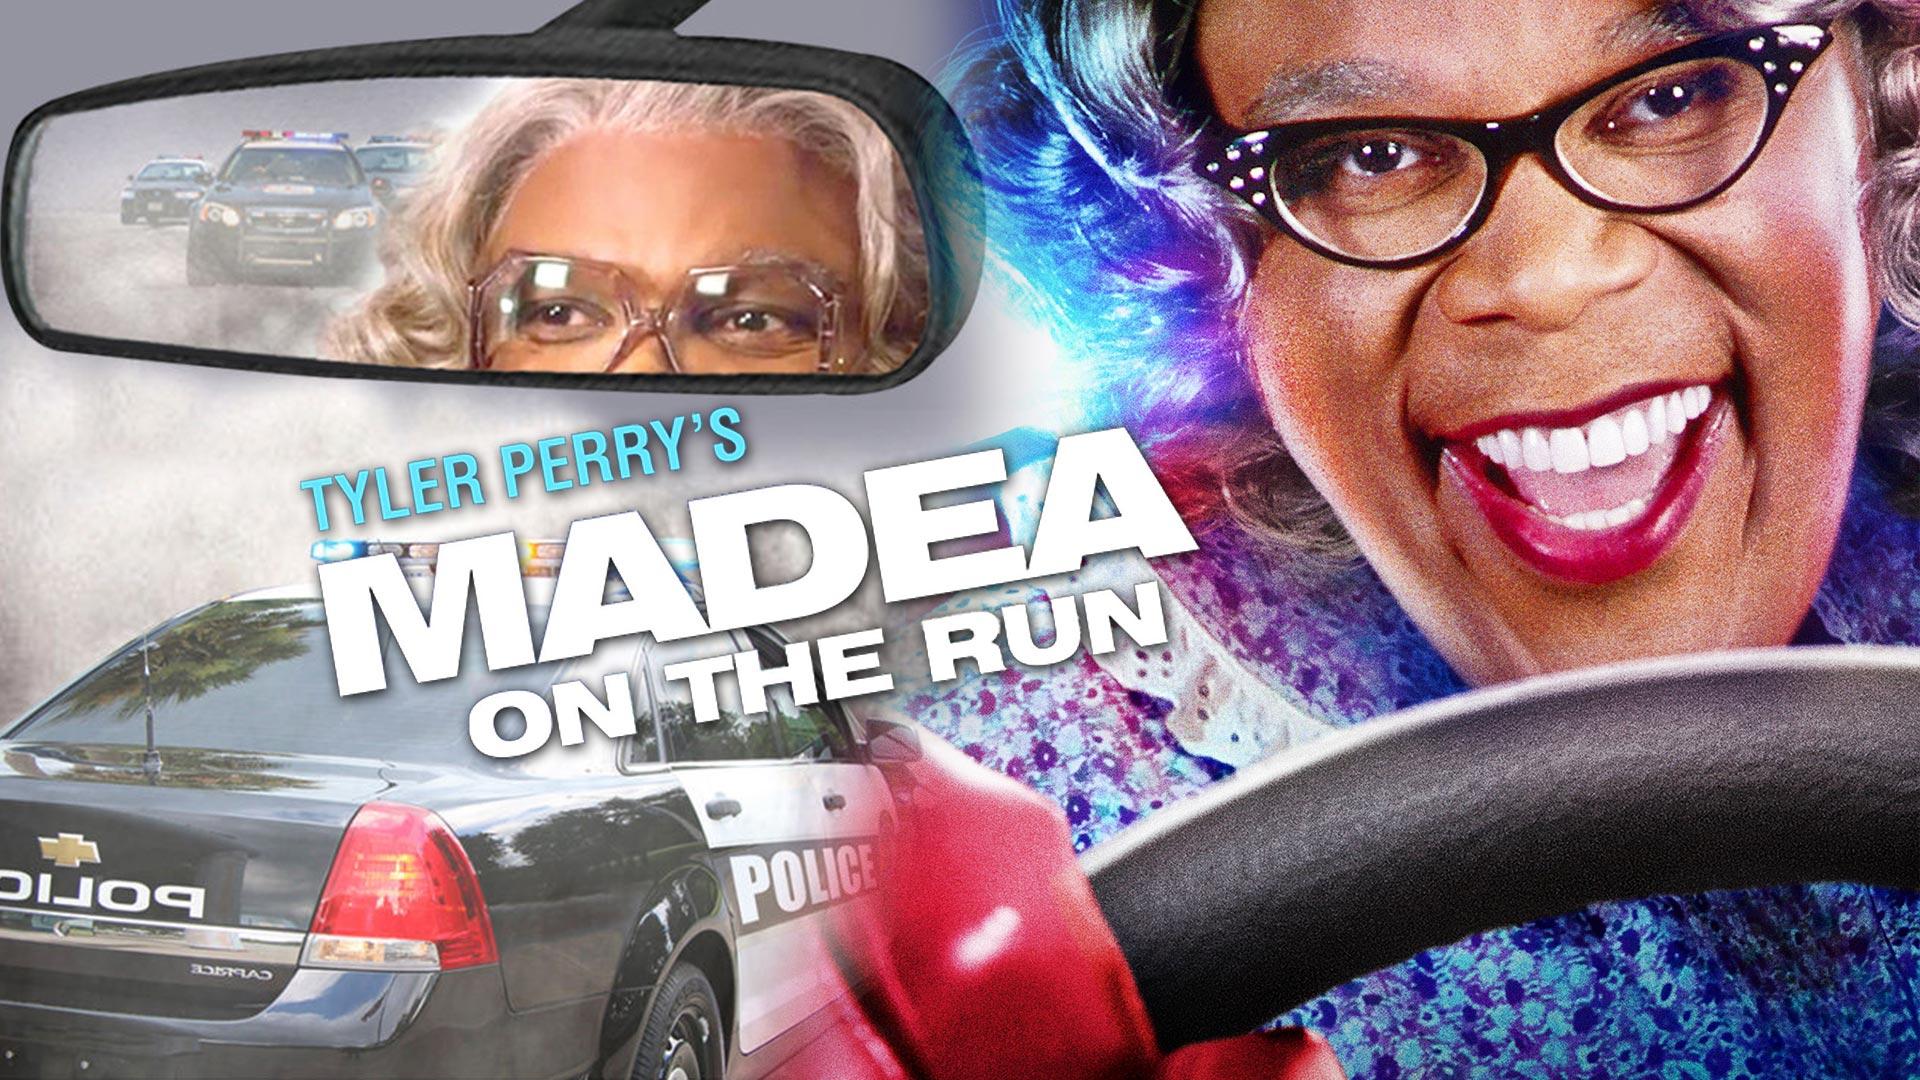 Tyler Perry's Madea on the Run